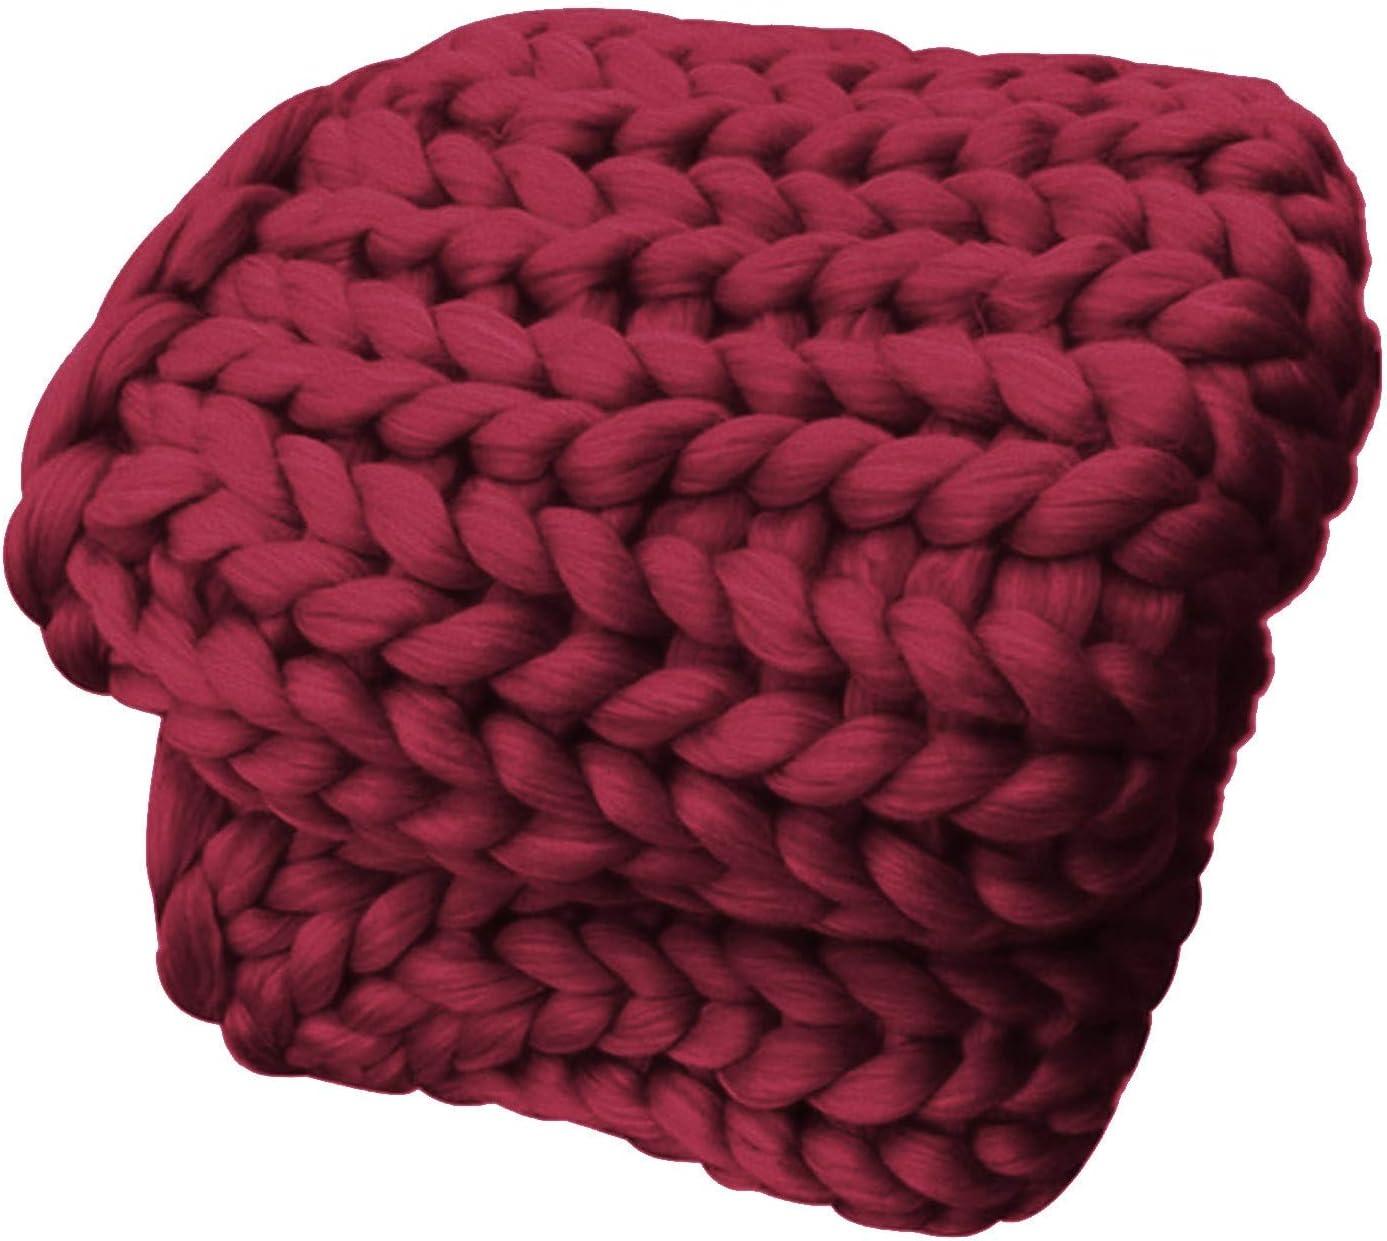 HDGZ wholesale Chunky Knit Blanket Handmade Soft Popular brand by Kn